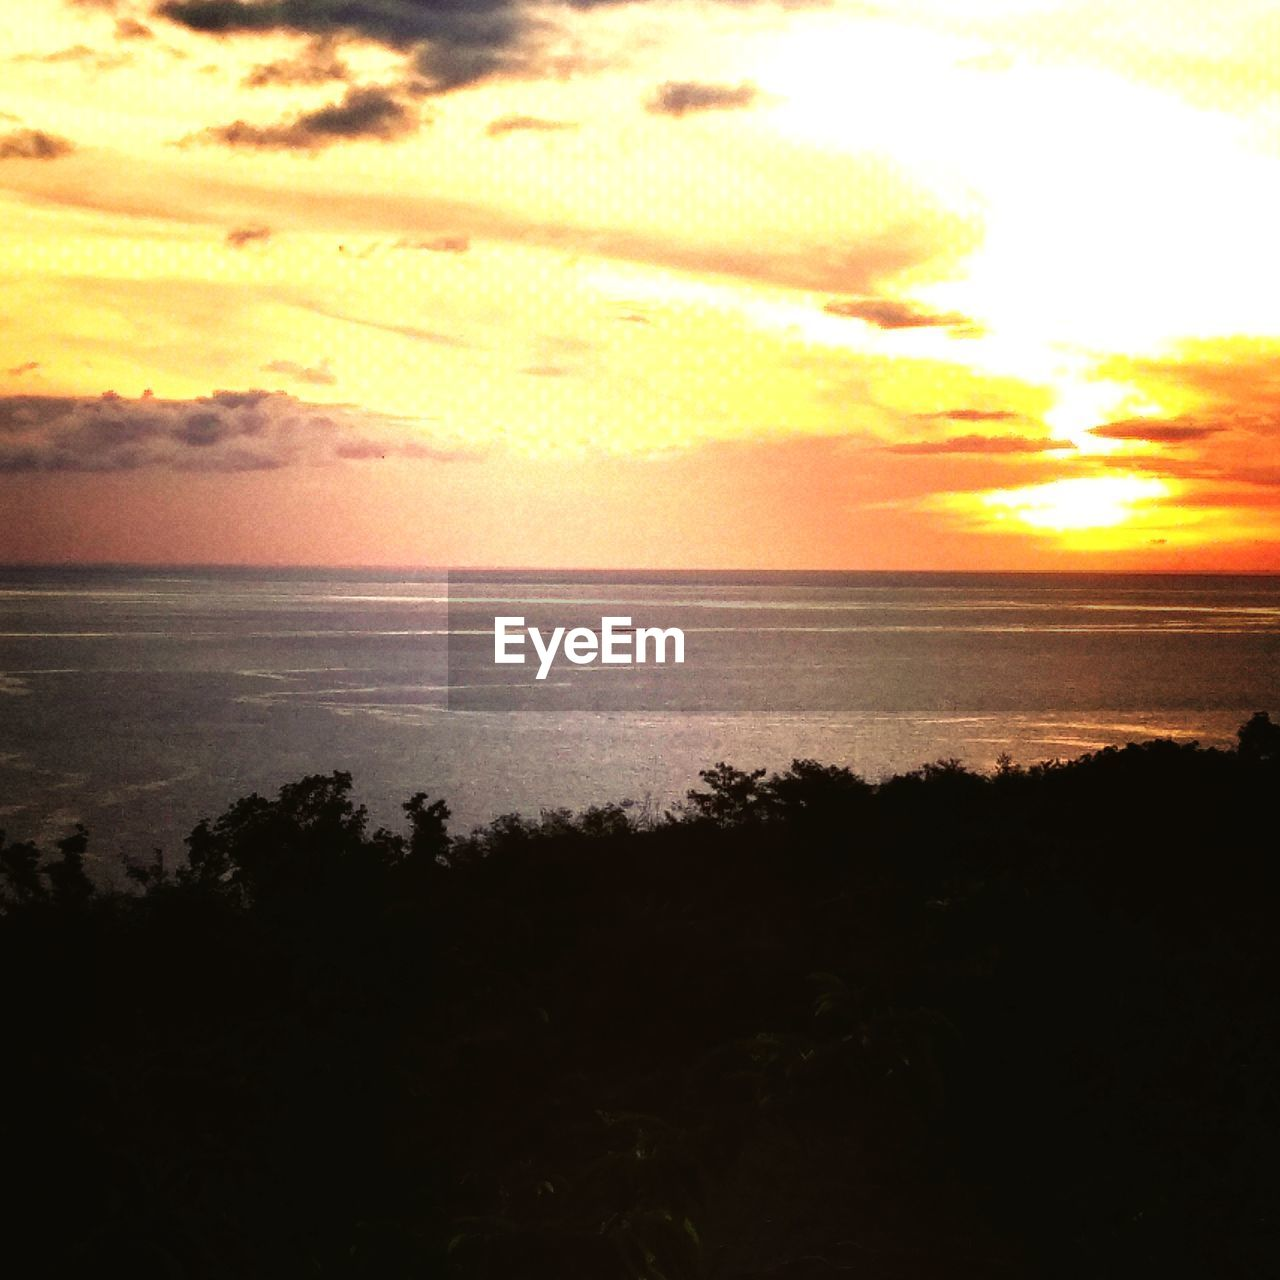 sky, sunset, scenics - nature, sea, beauty in nature, water, tranquility, cloud - sky, horizon over water, tranquil scene, land, nature, horizon, beach, no people, idyllic, orange color, sunlight, silhouette, outdoors, sun